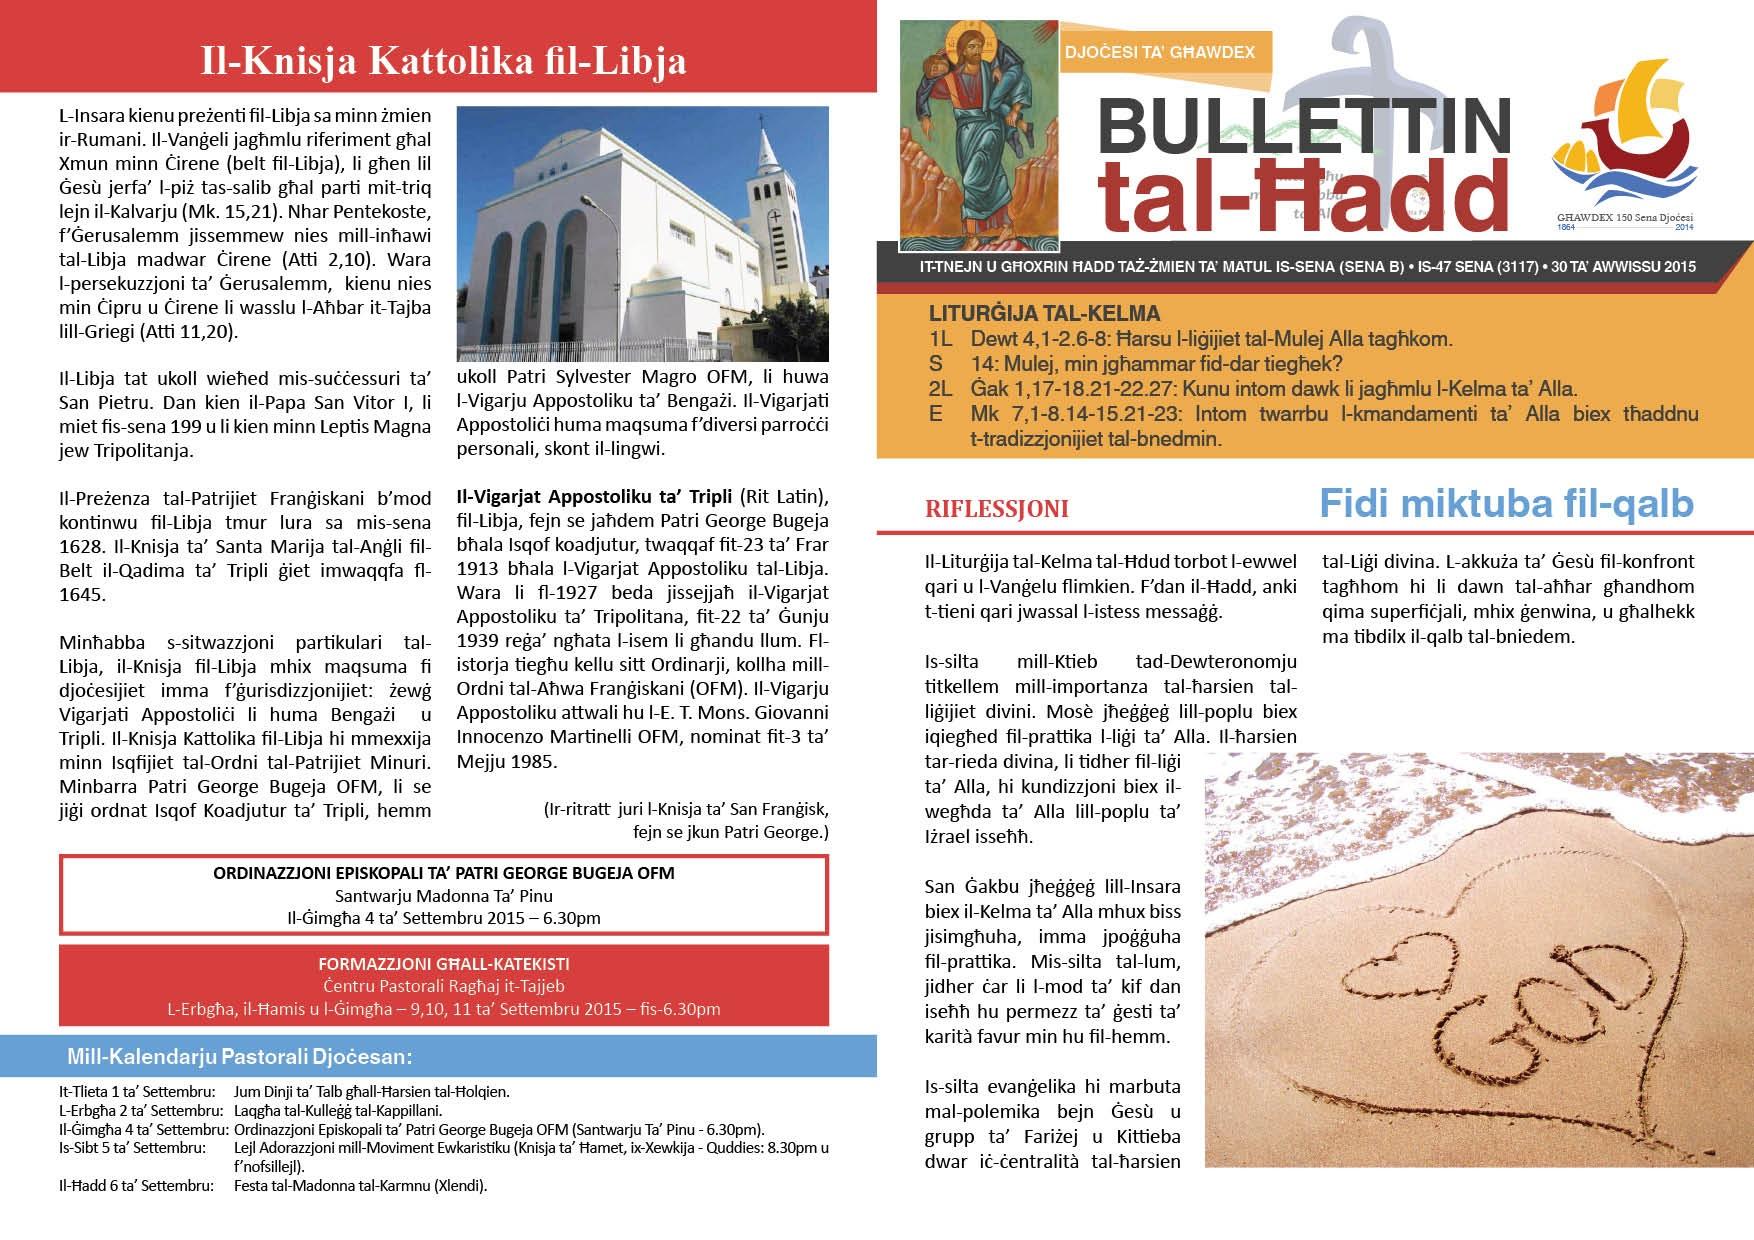 bullettin-2015-awwissu-30.jpg